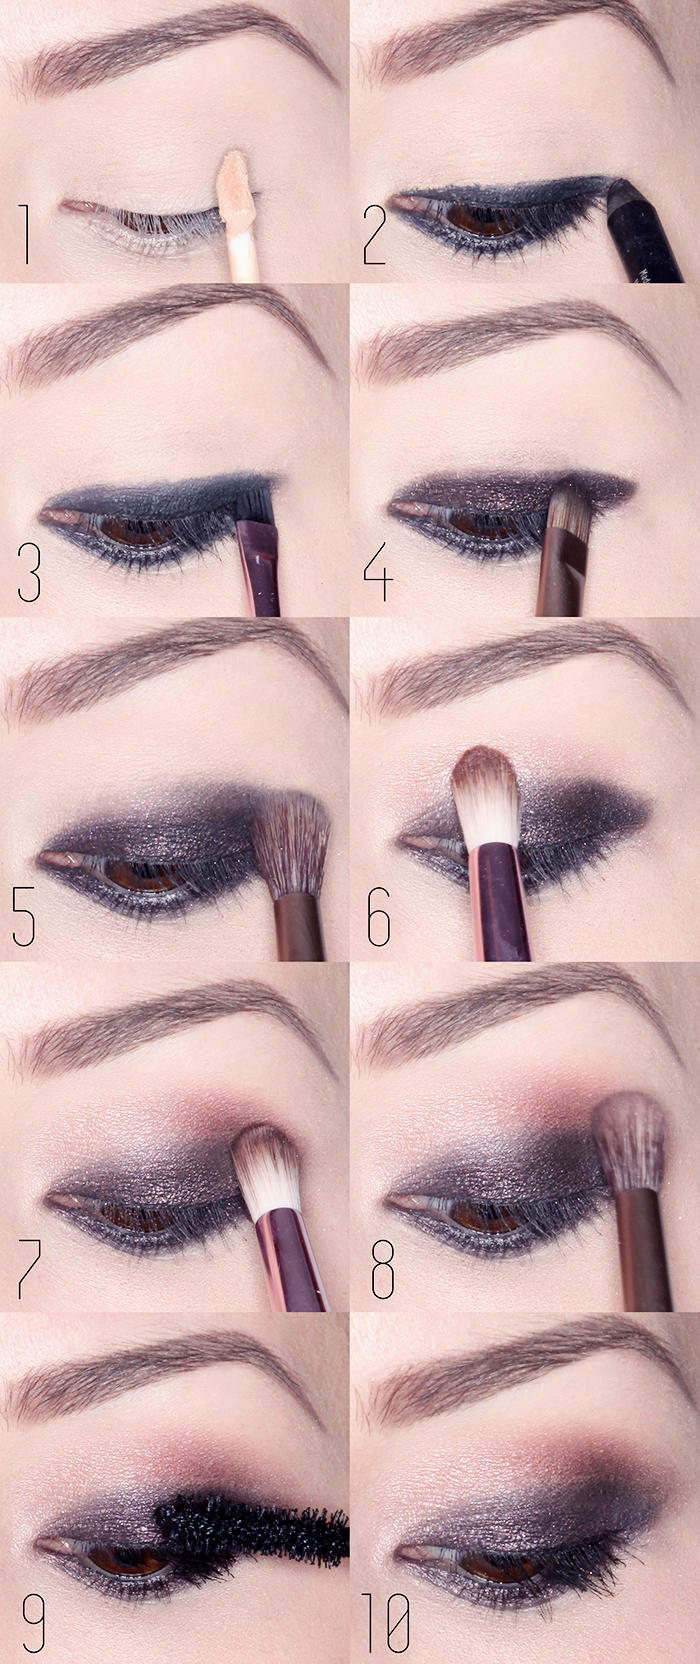 Favoloso Makeup Monday: Urban Decay Naked 3 Tutorial - Keiko Lynn WQ72